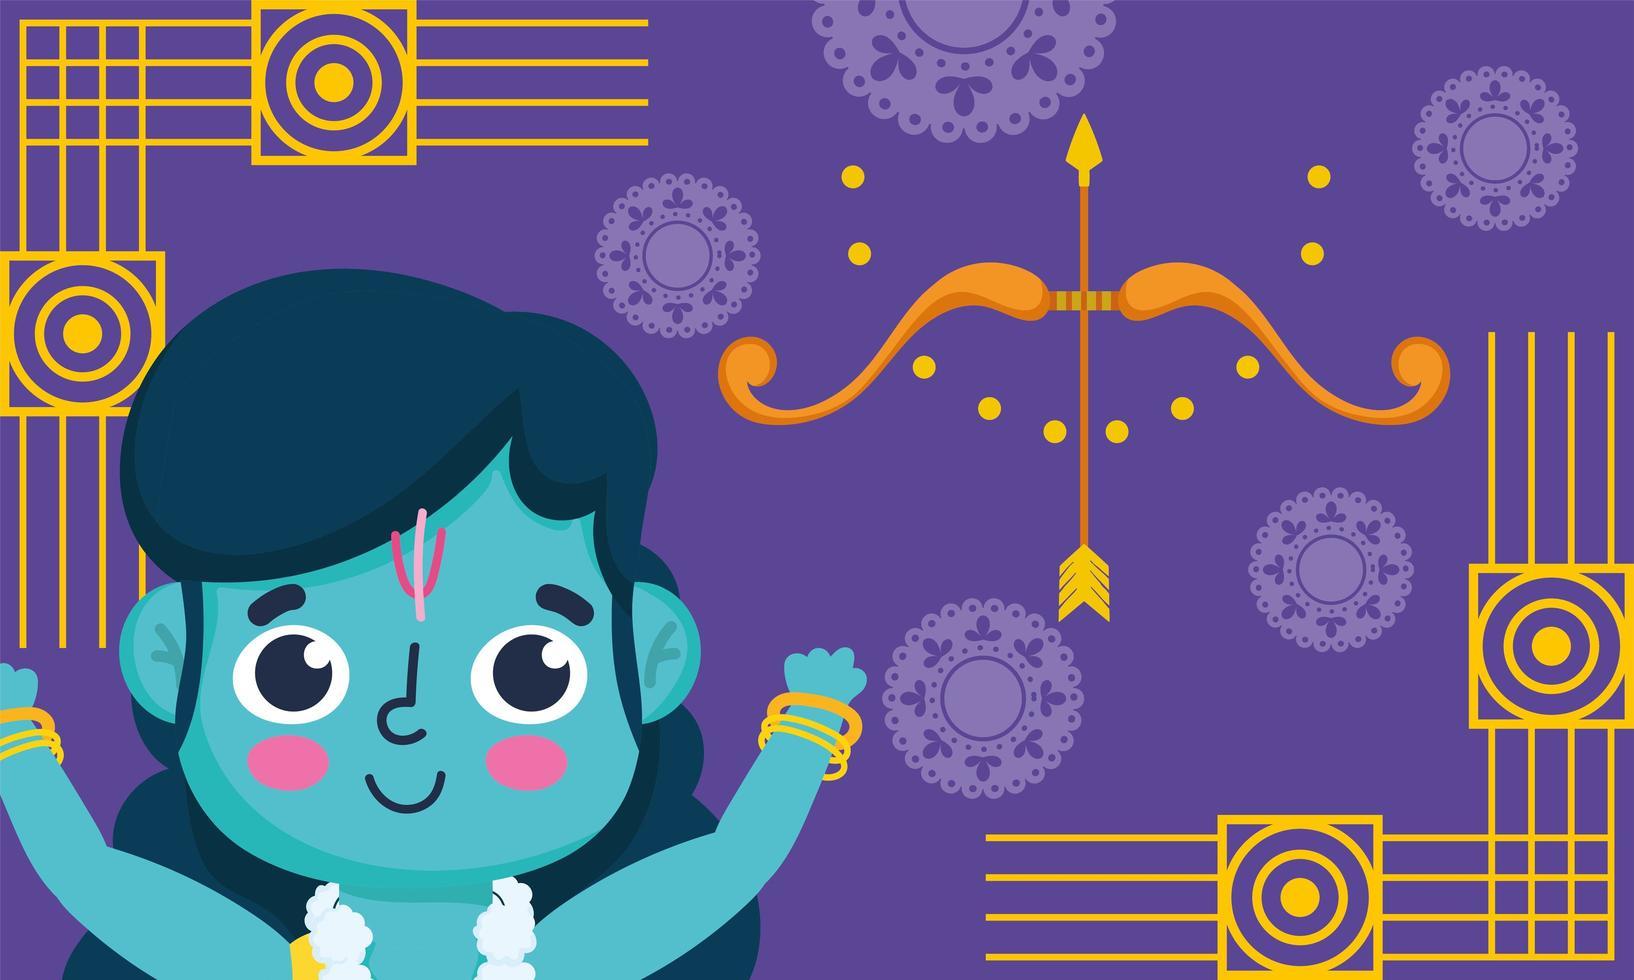 Happy Dussehra Festival von Indien, Lord Rama Cartoon vektor